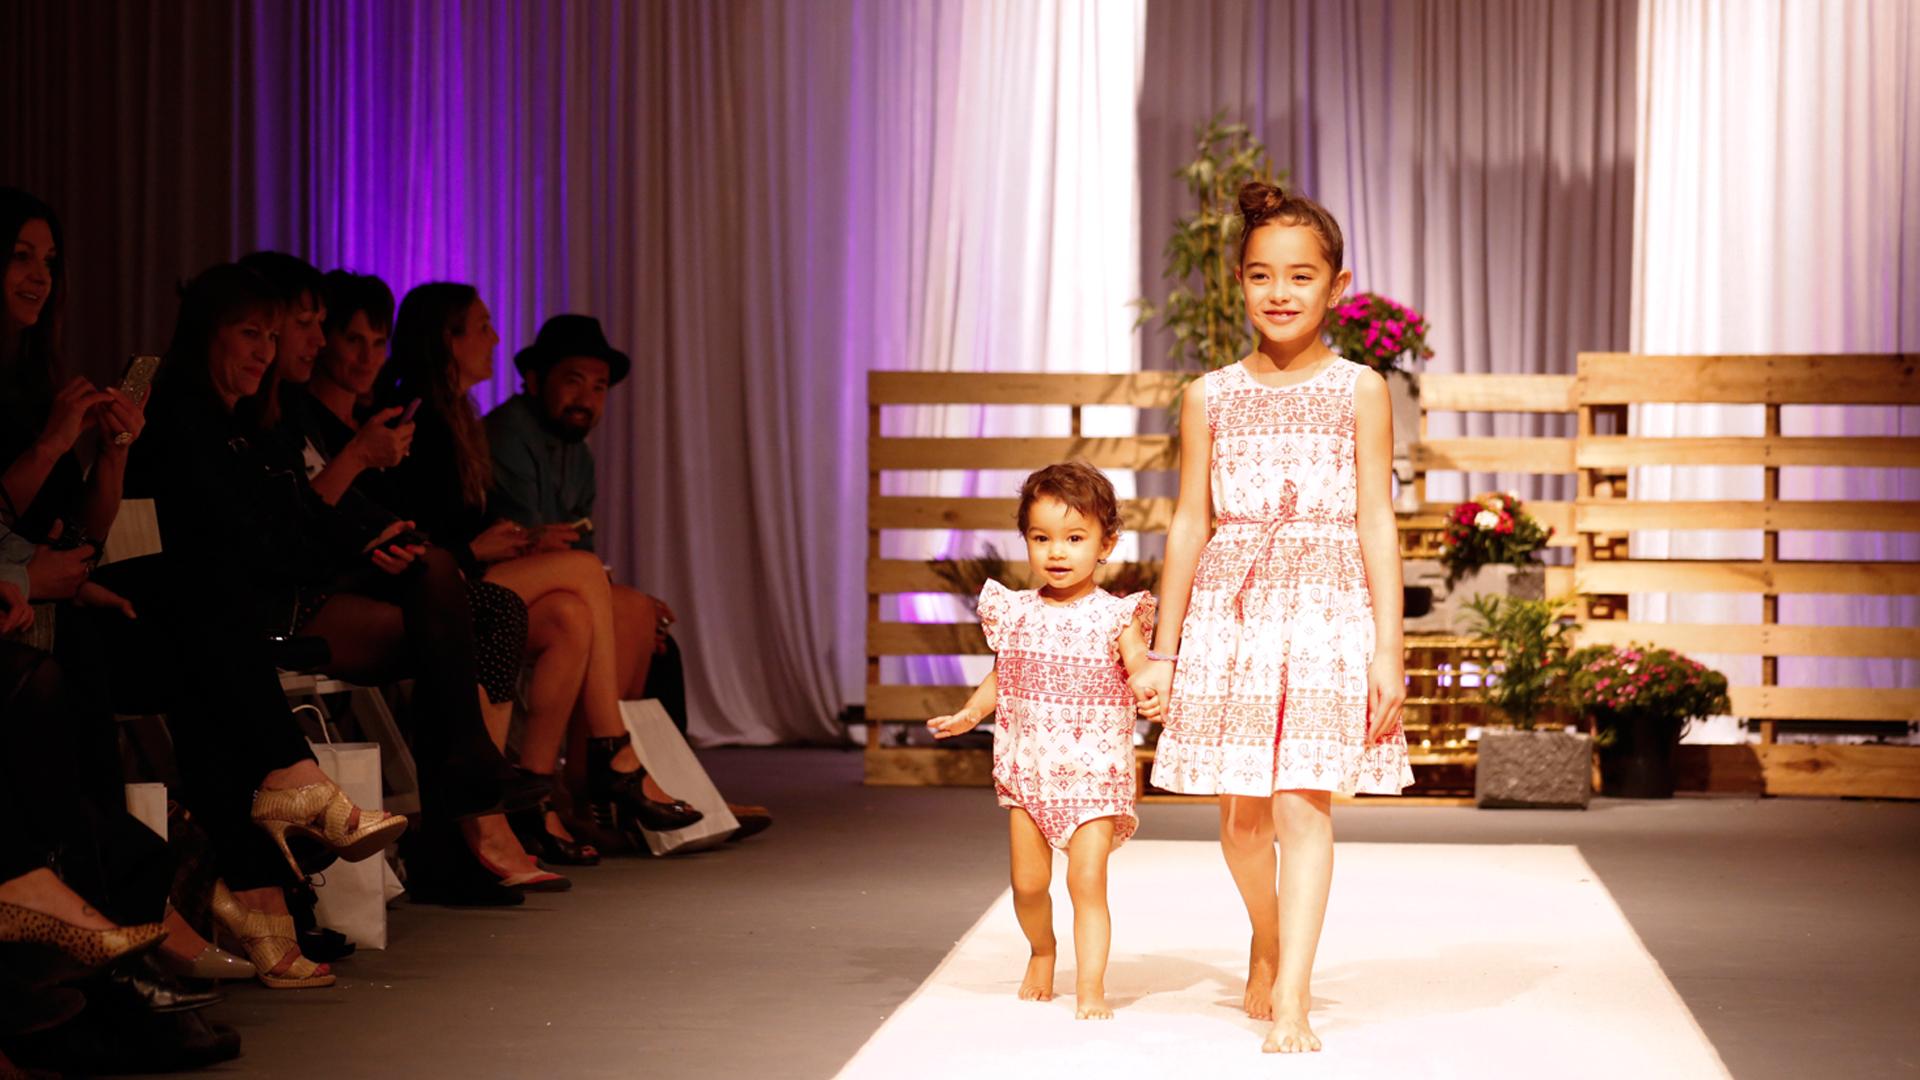 The Little Runway Children's Fashion Event